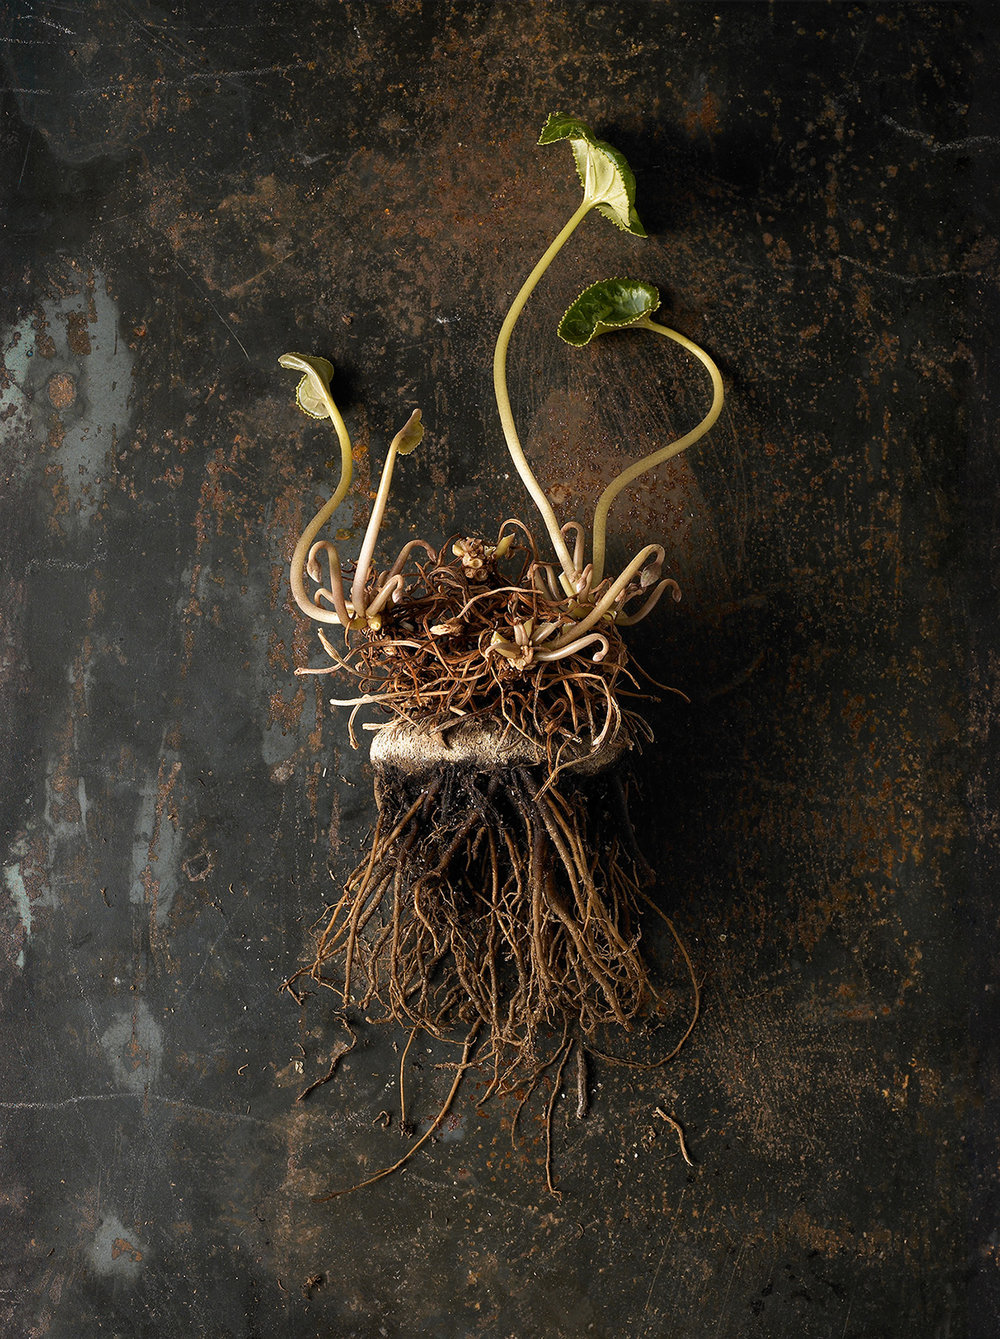 52_Beth_Galton_Roots_Cyclamen_2.jpg